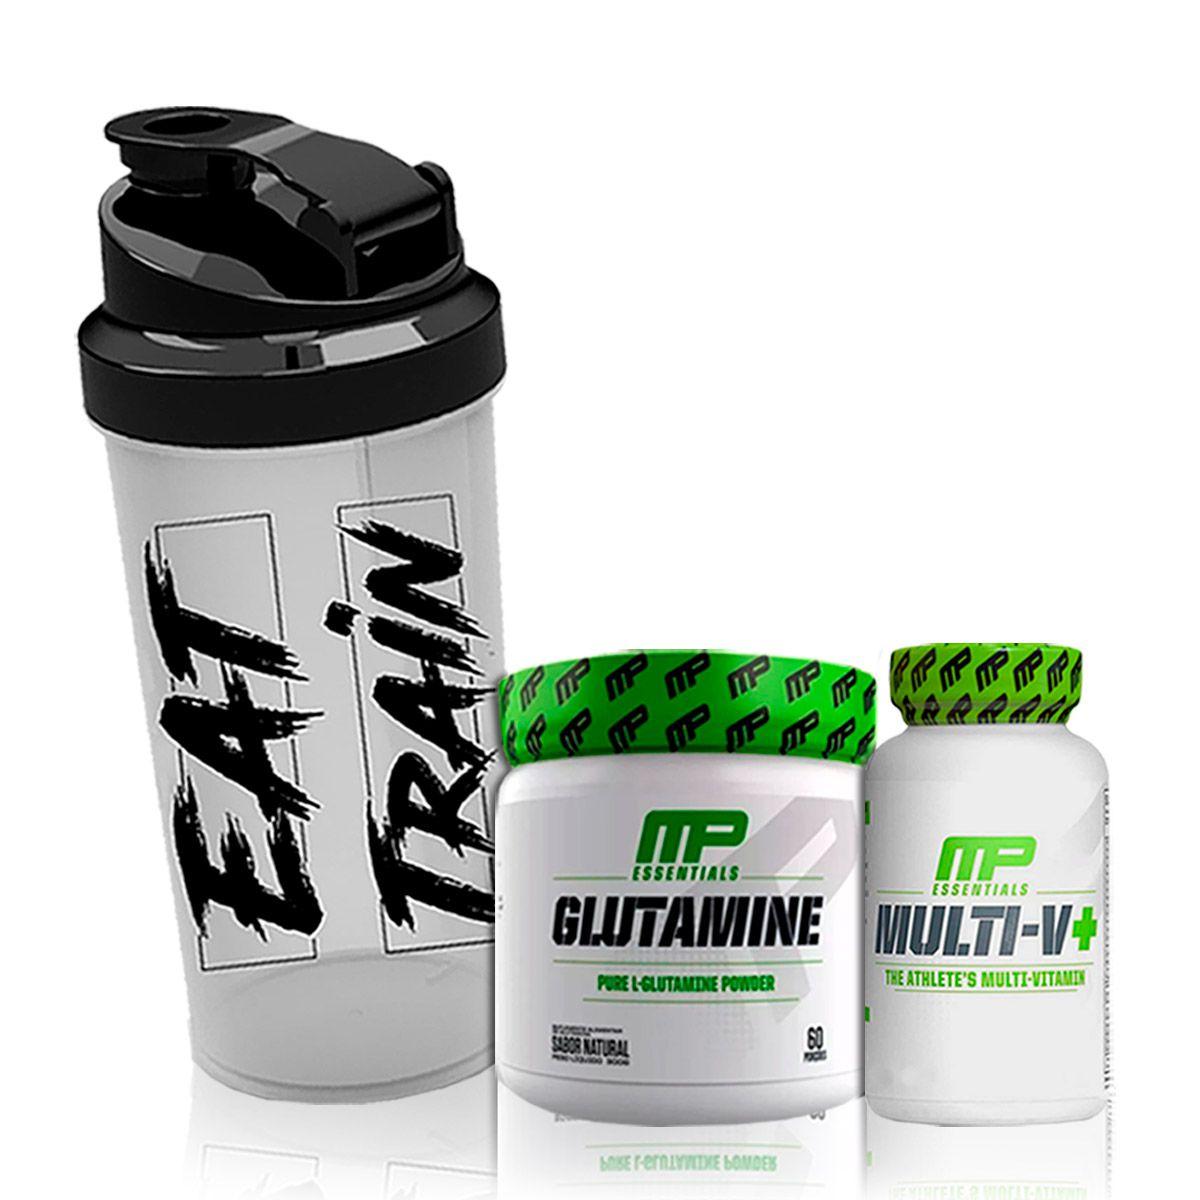 Kit Glutamine 300g + Mult-V Multivitaminico 60 Cápsulas + Coqueteleira - Muscle Pharm